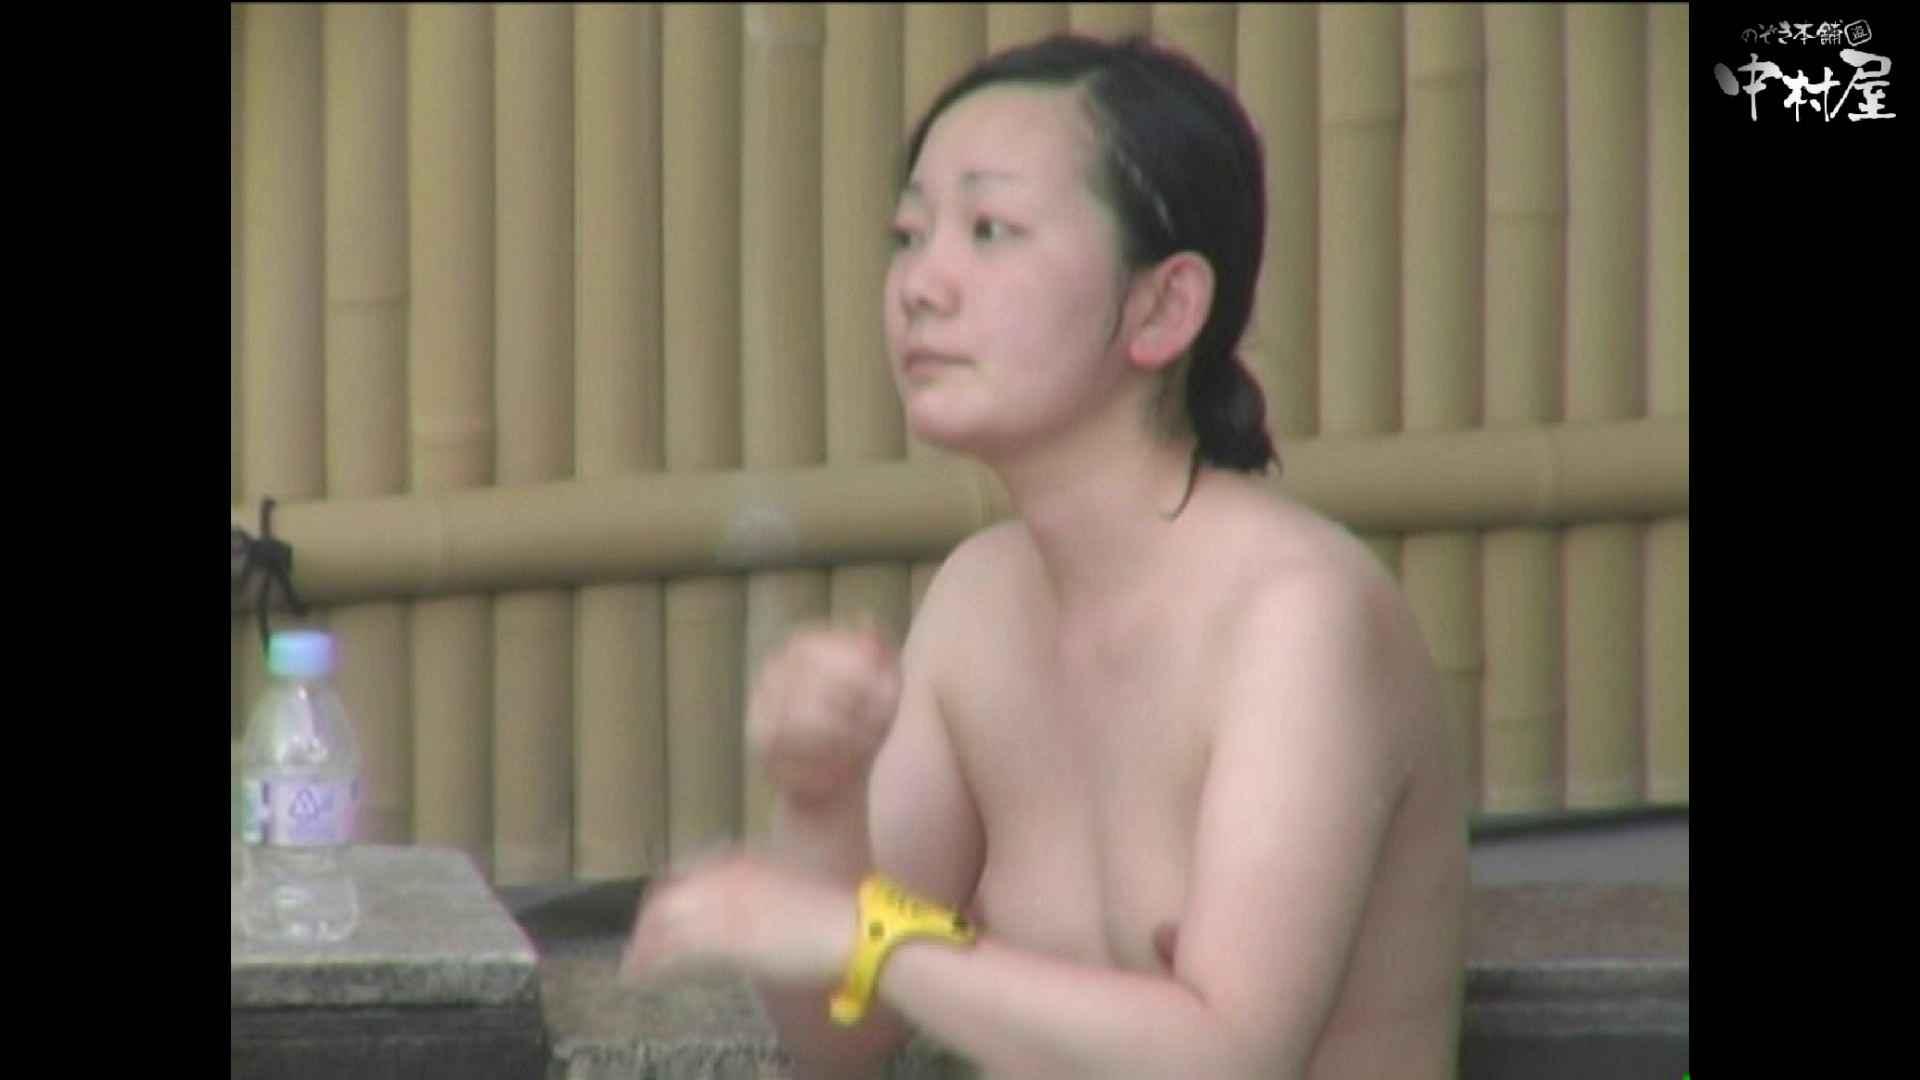 Aquaな露天風呂Vol.892 盗撮 われめAV動画紹介 80画像 80